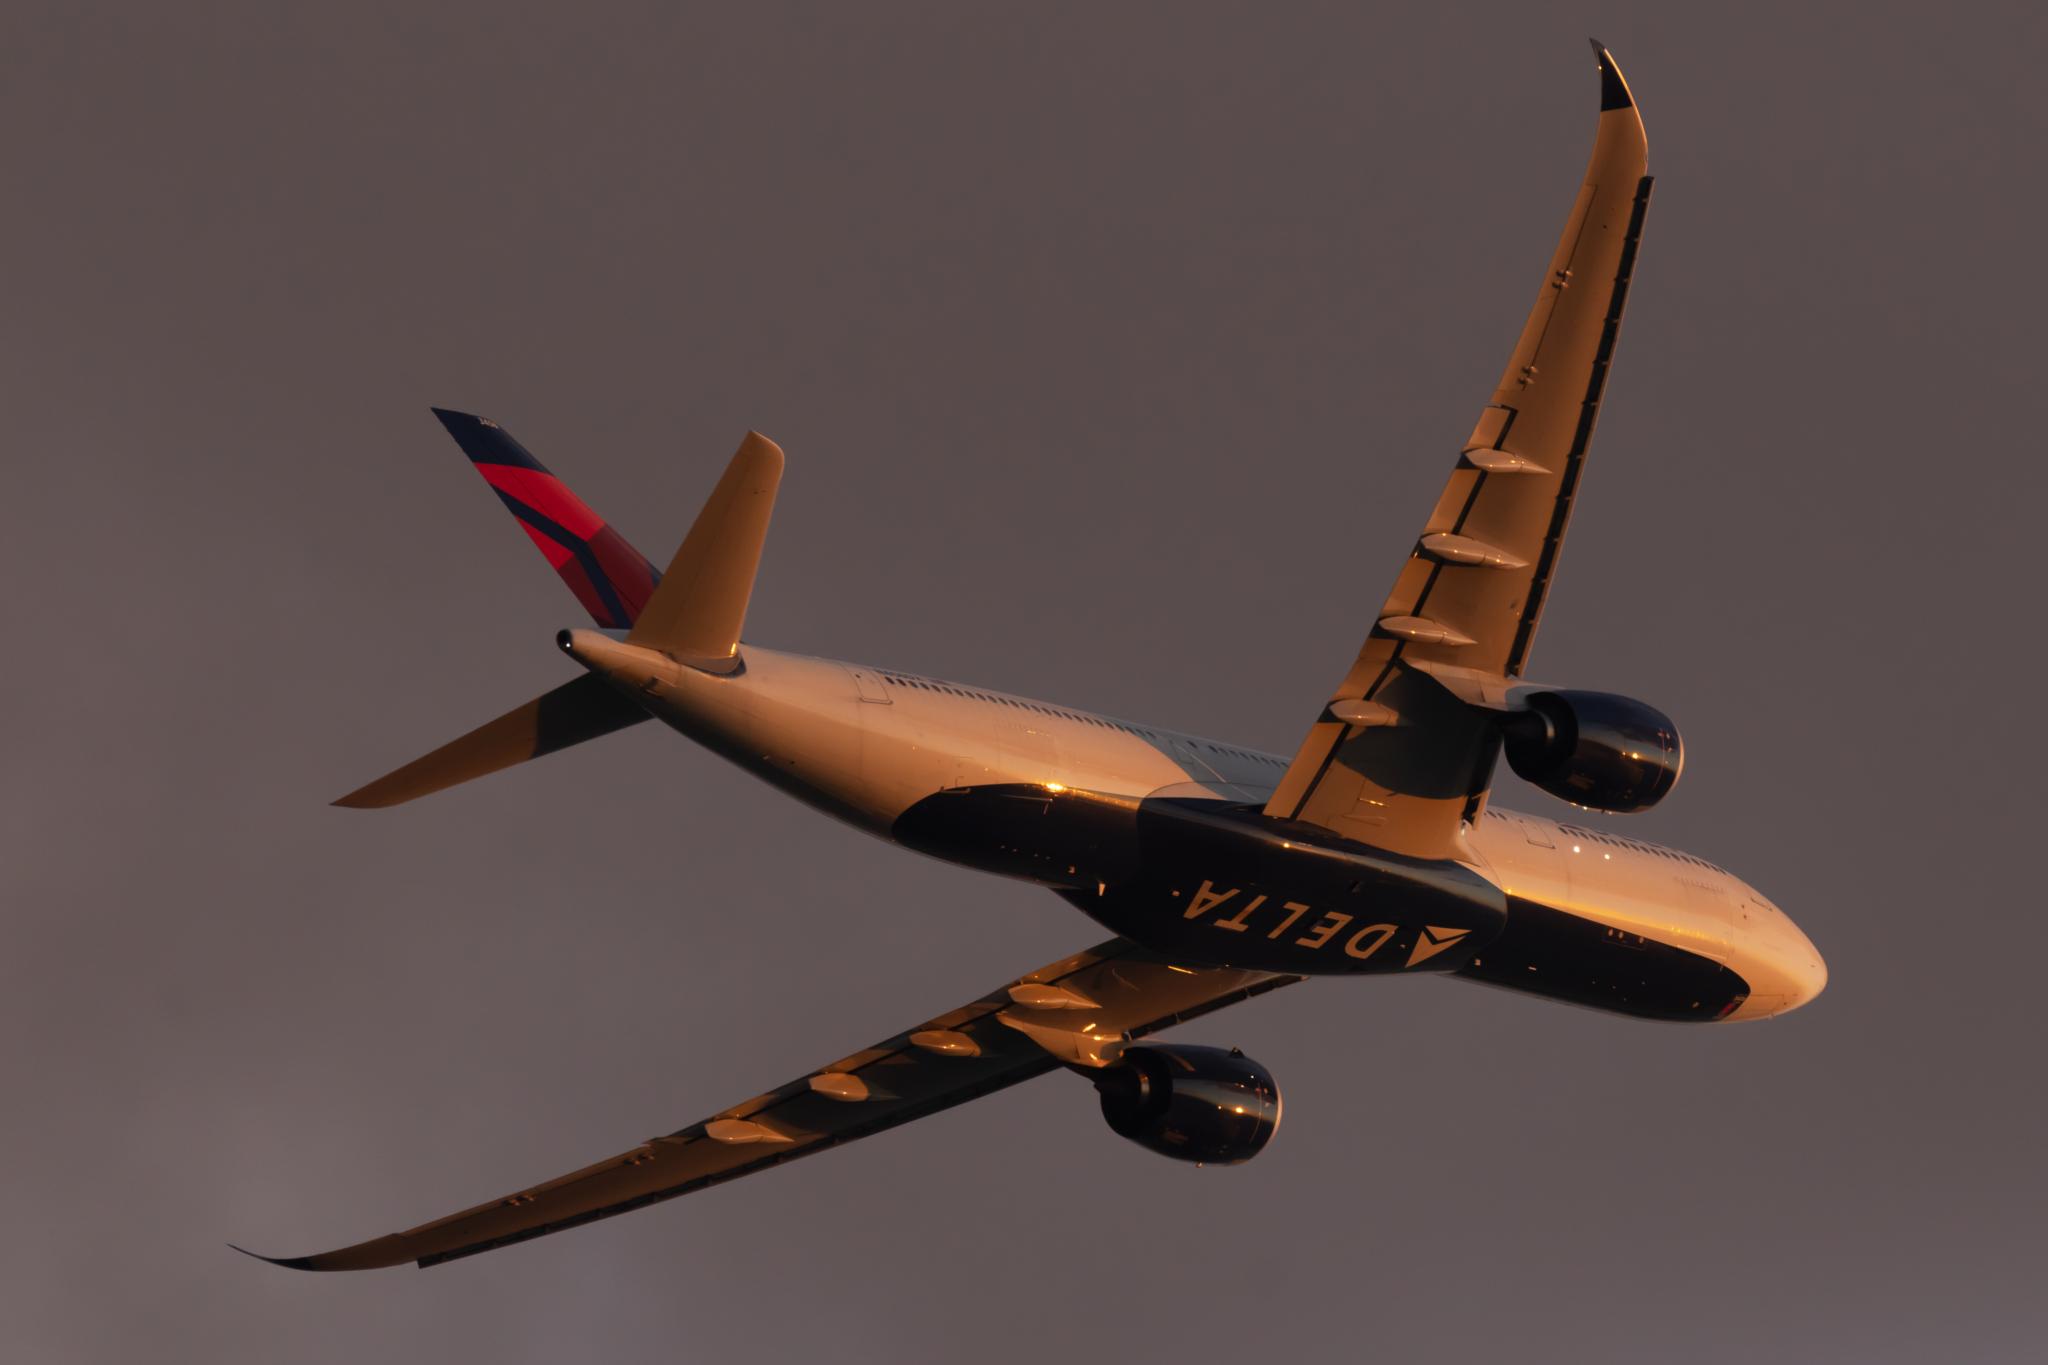 Delta-Airbus-A330-2048x1365.jpg